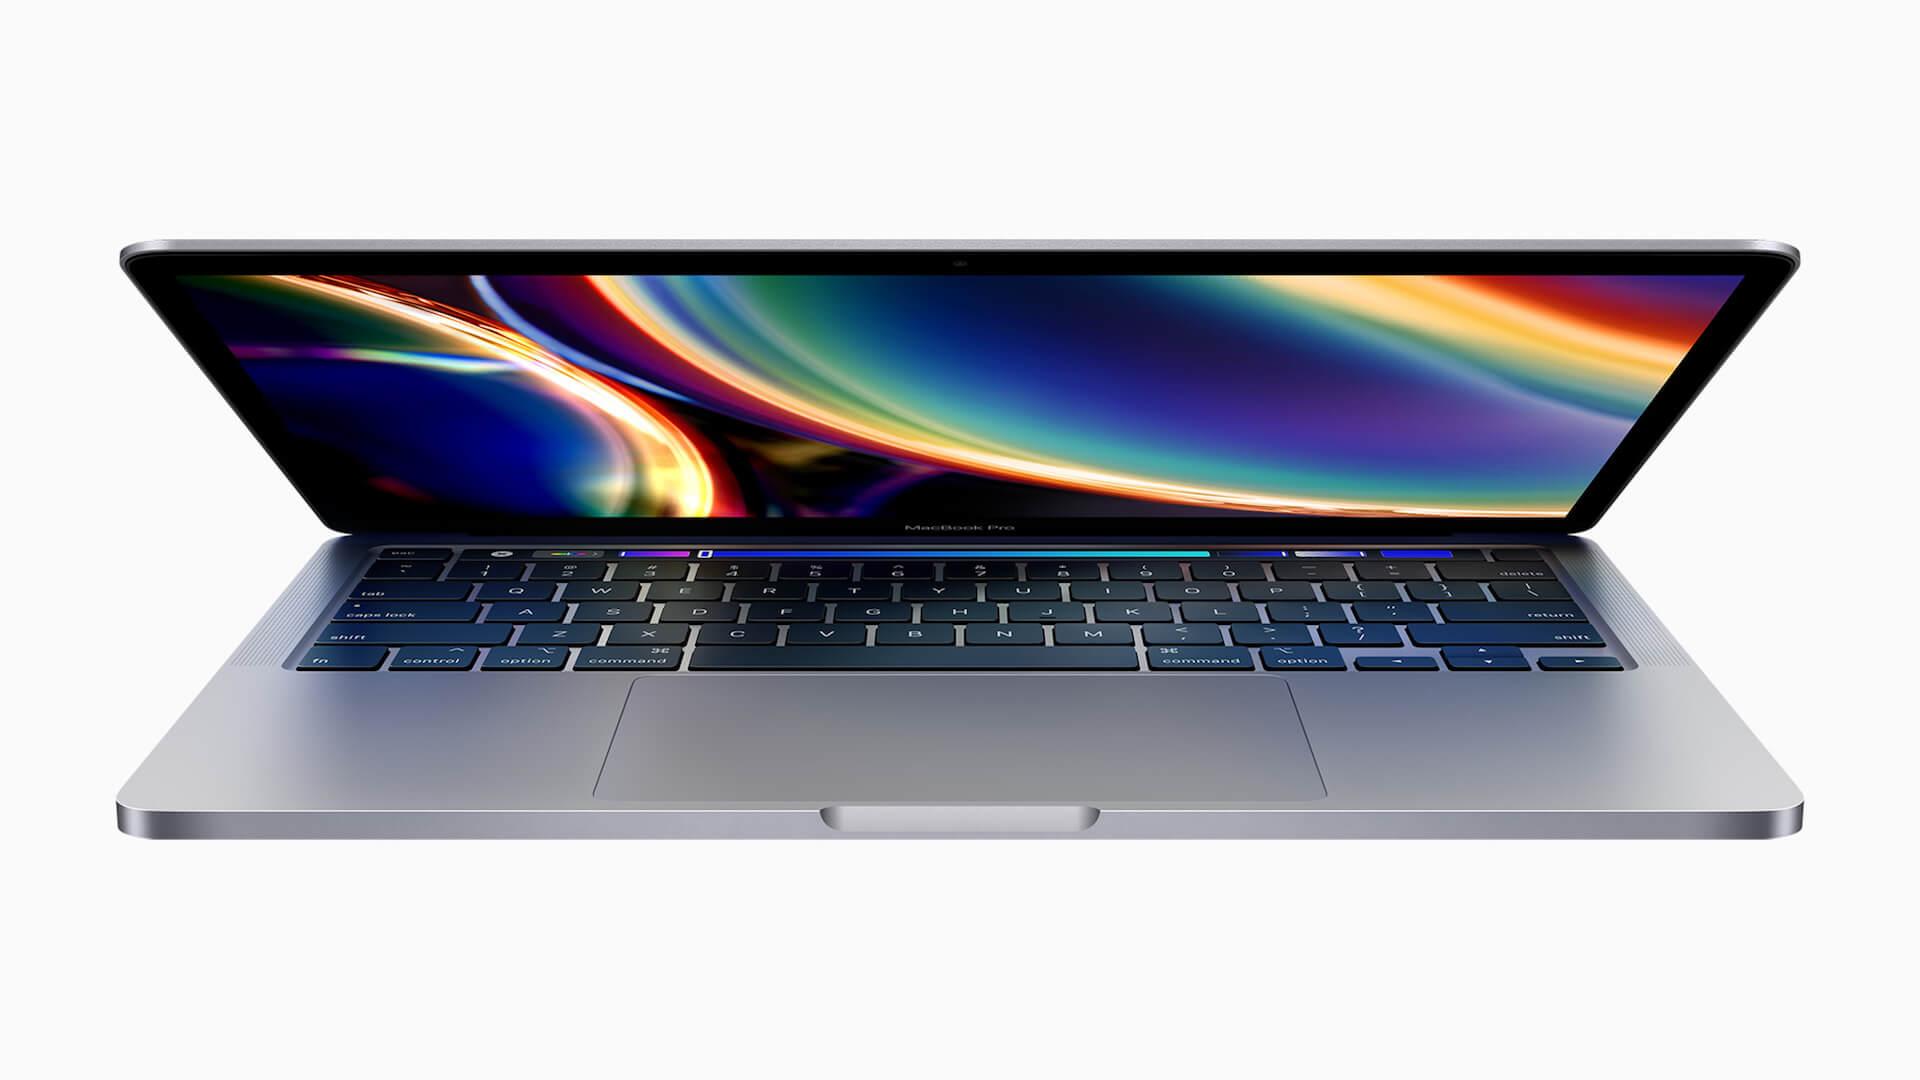 MacBook Pro、iPad Pro、iMacがミニLEDを搭載!?2021年発表濃厚か tech200527_macbookpro_1